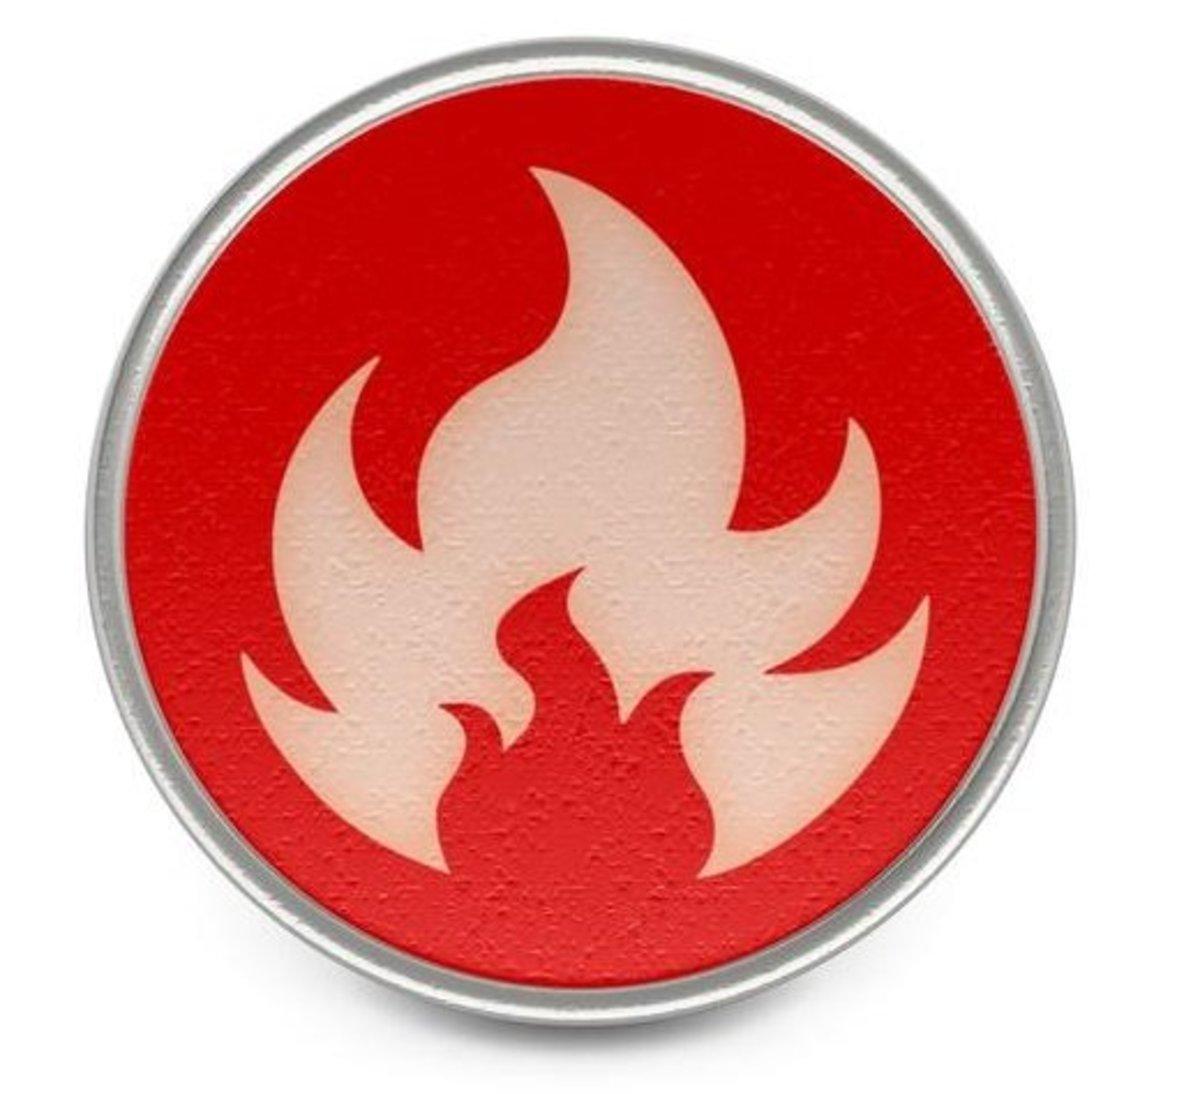 Fire Pokémon logo